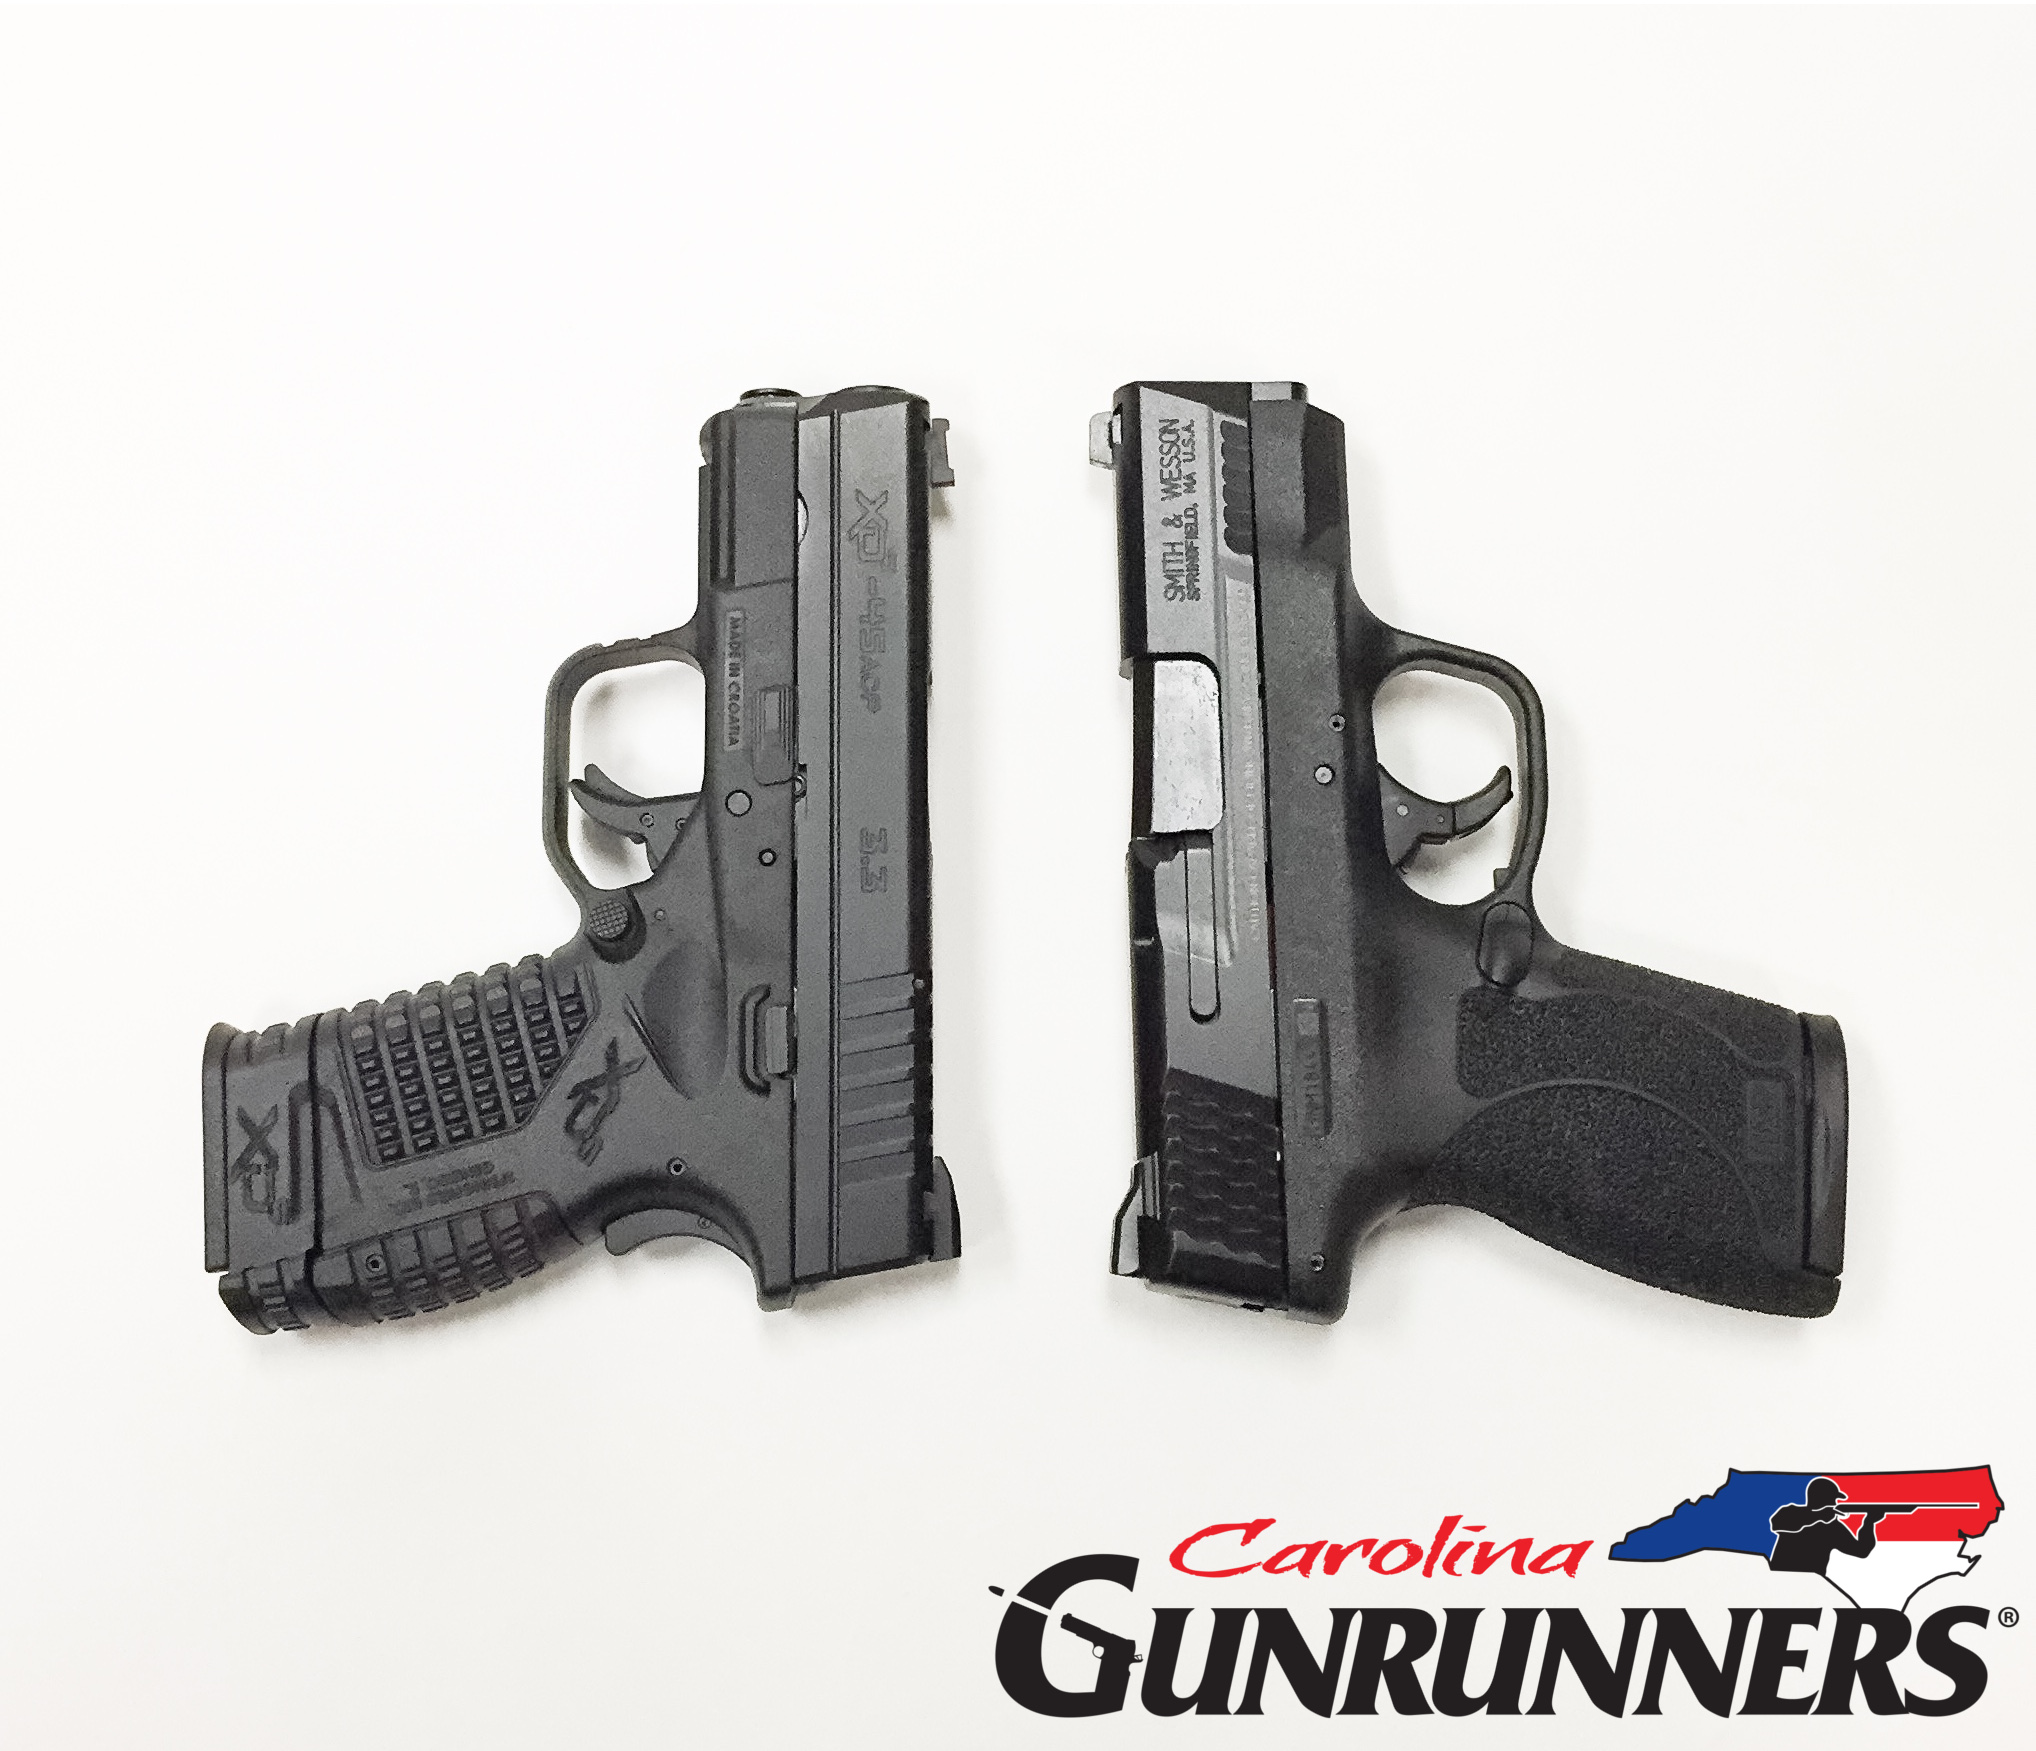 Smith & Wesson Shield 45 Review | Carolina Gunrunners